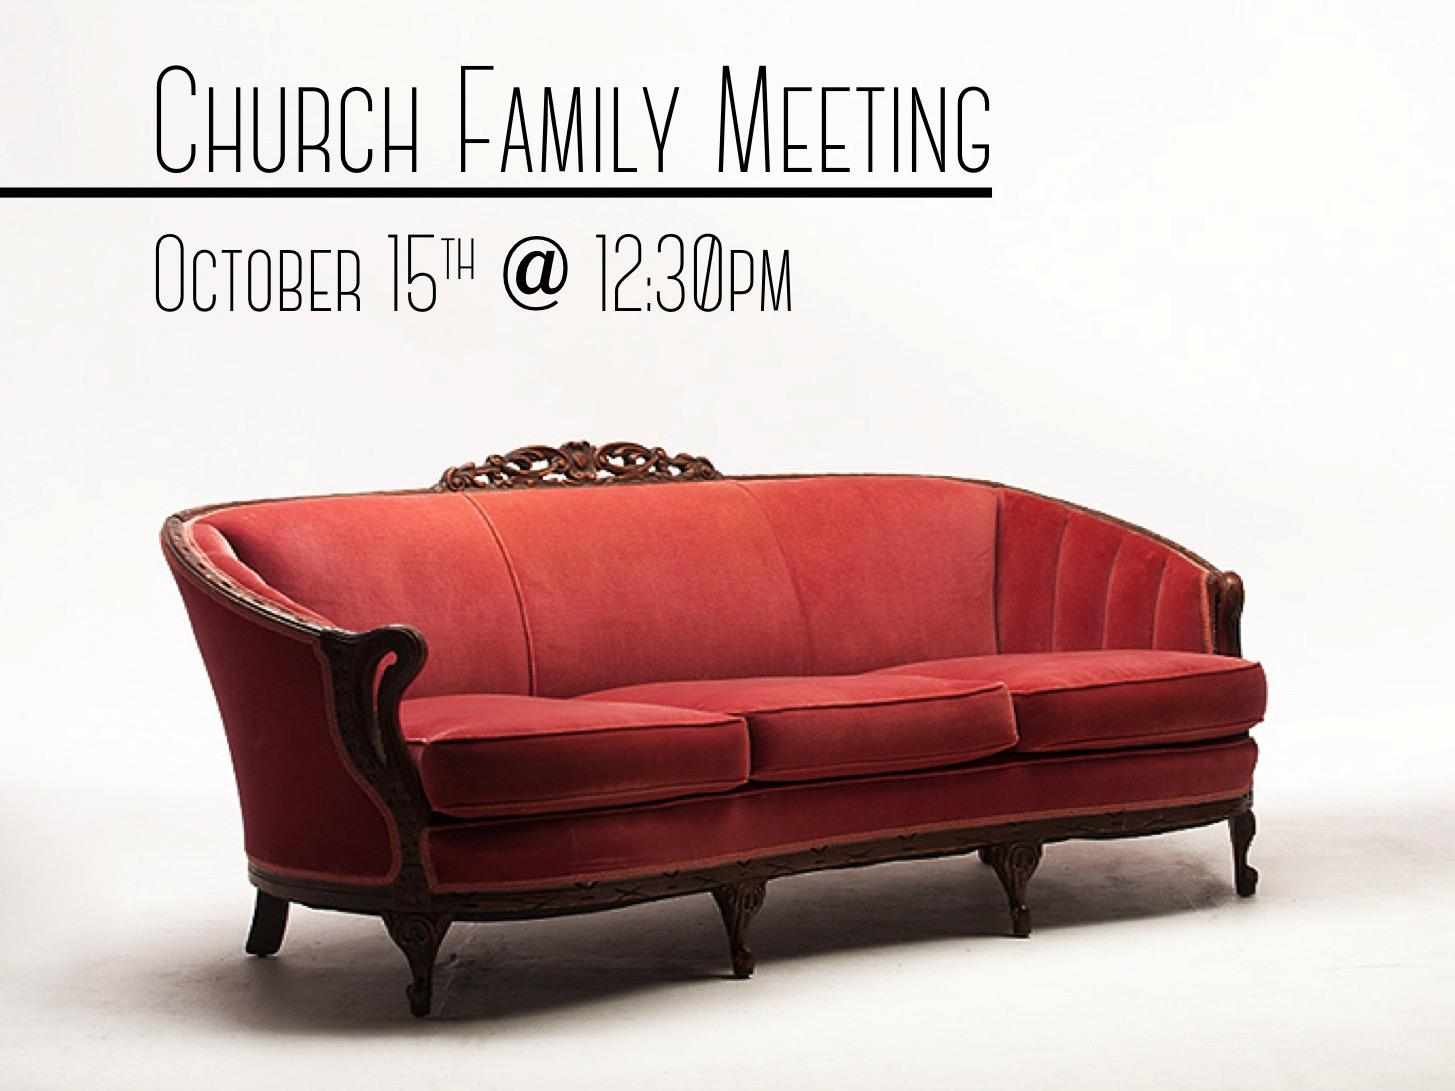 Church Family Meeting (OCT17).jpg